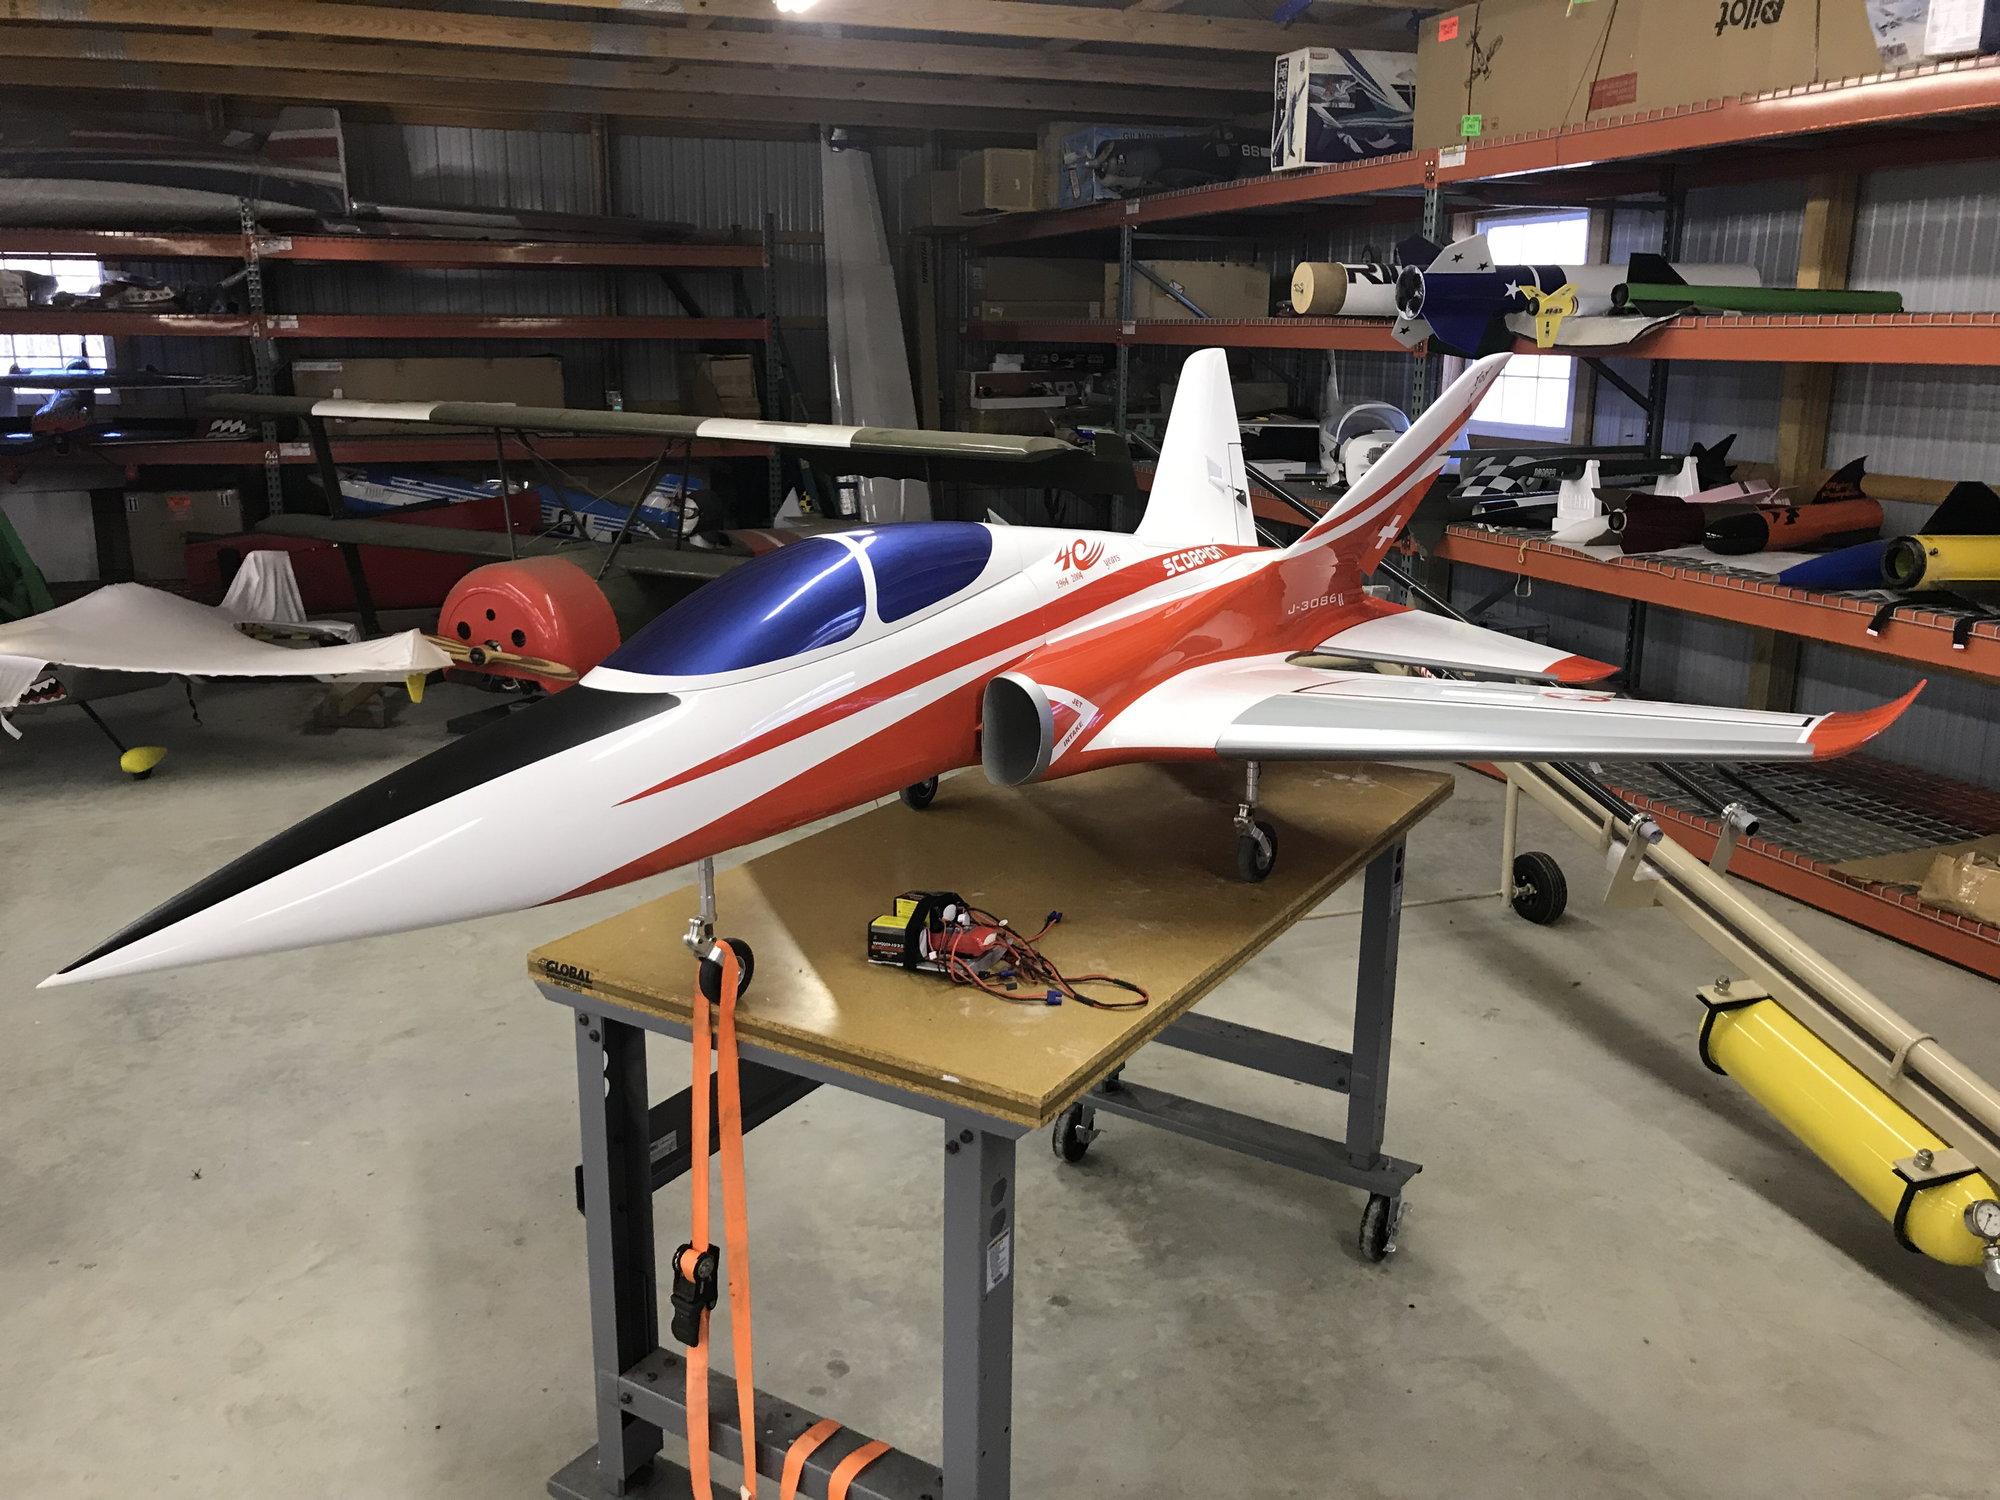 Aviation Design Super Scorpion Nearly New - RCU Forums